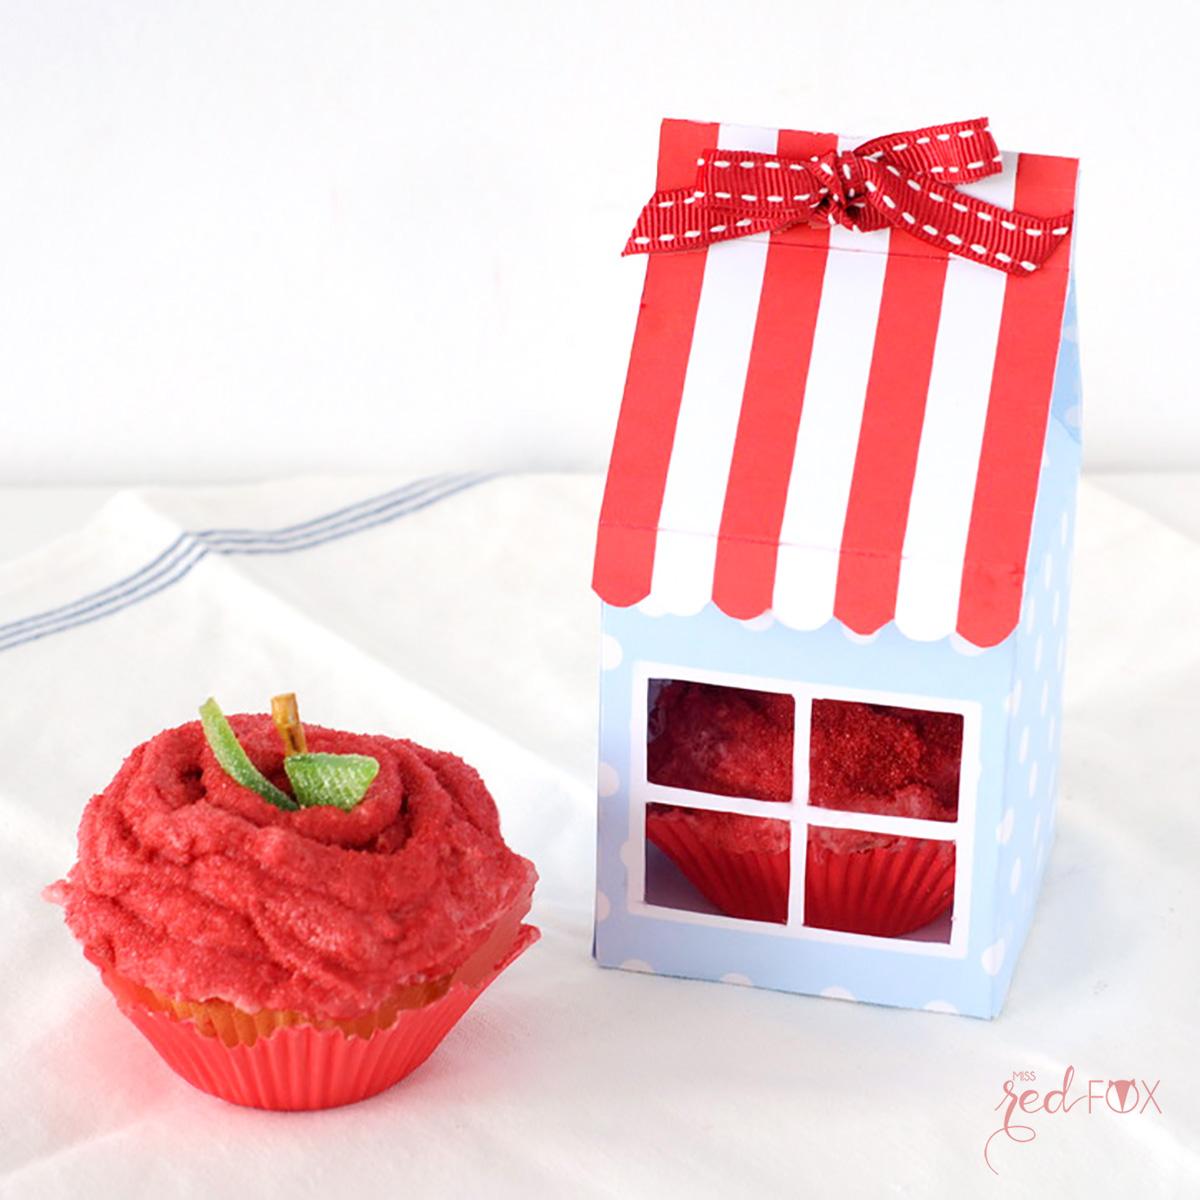 missredfox - 12giftswithlove - 10 - Süßes Geschenk - Apfel Cupcake mit Haus Verpackung - 05